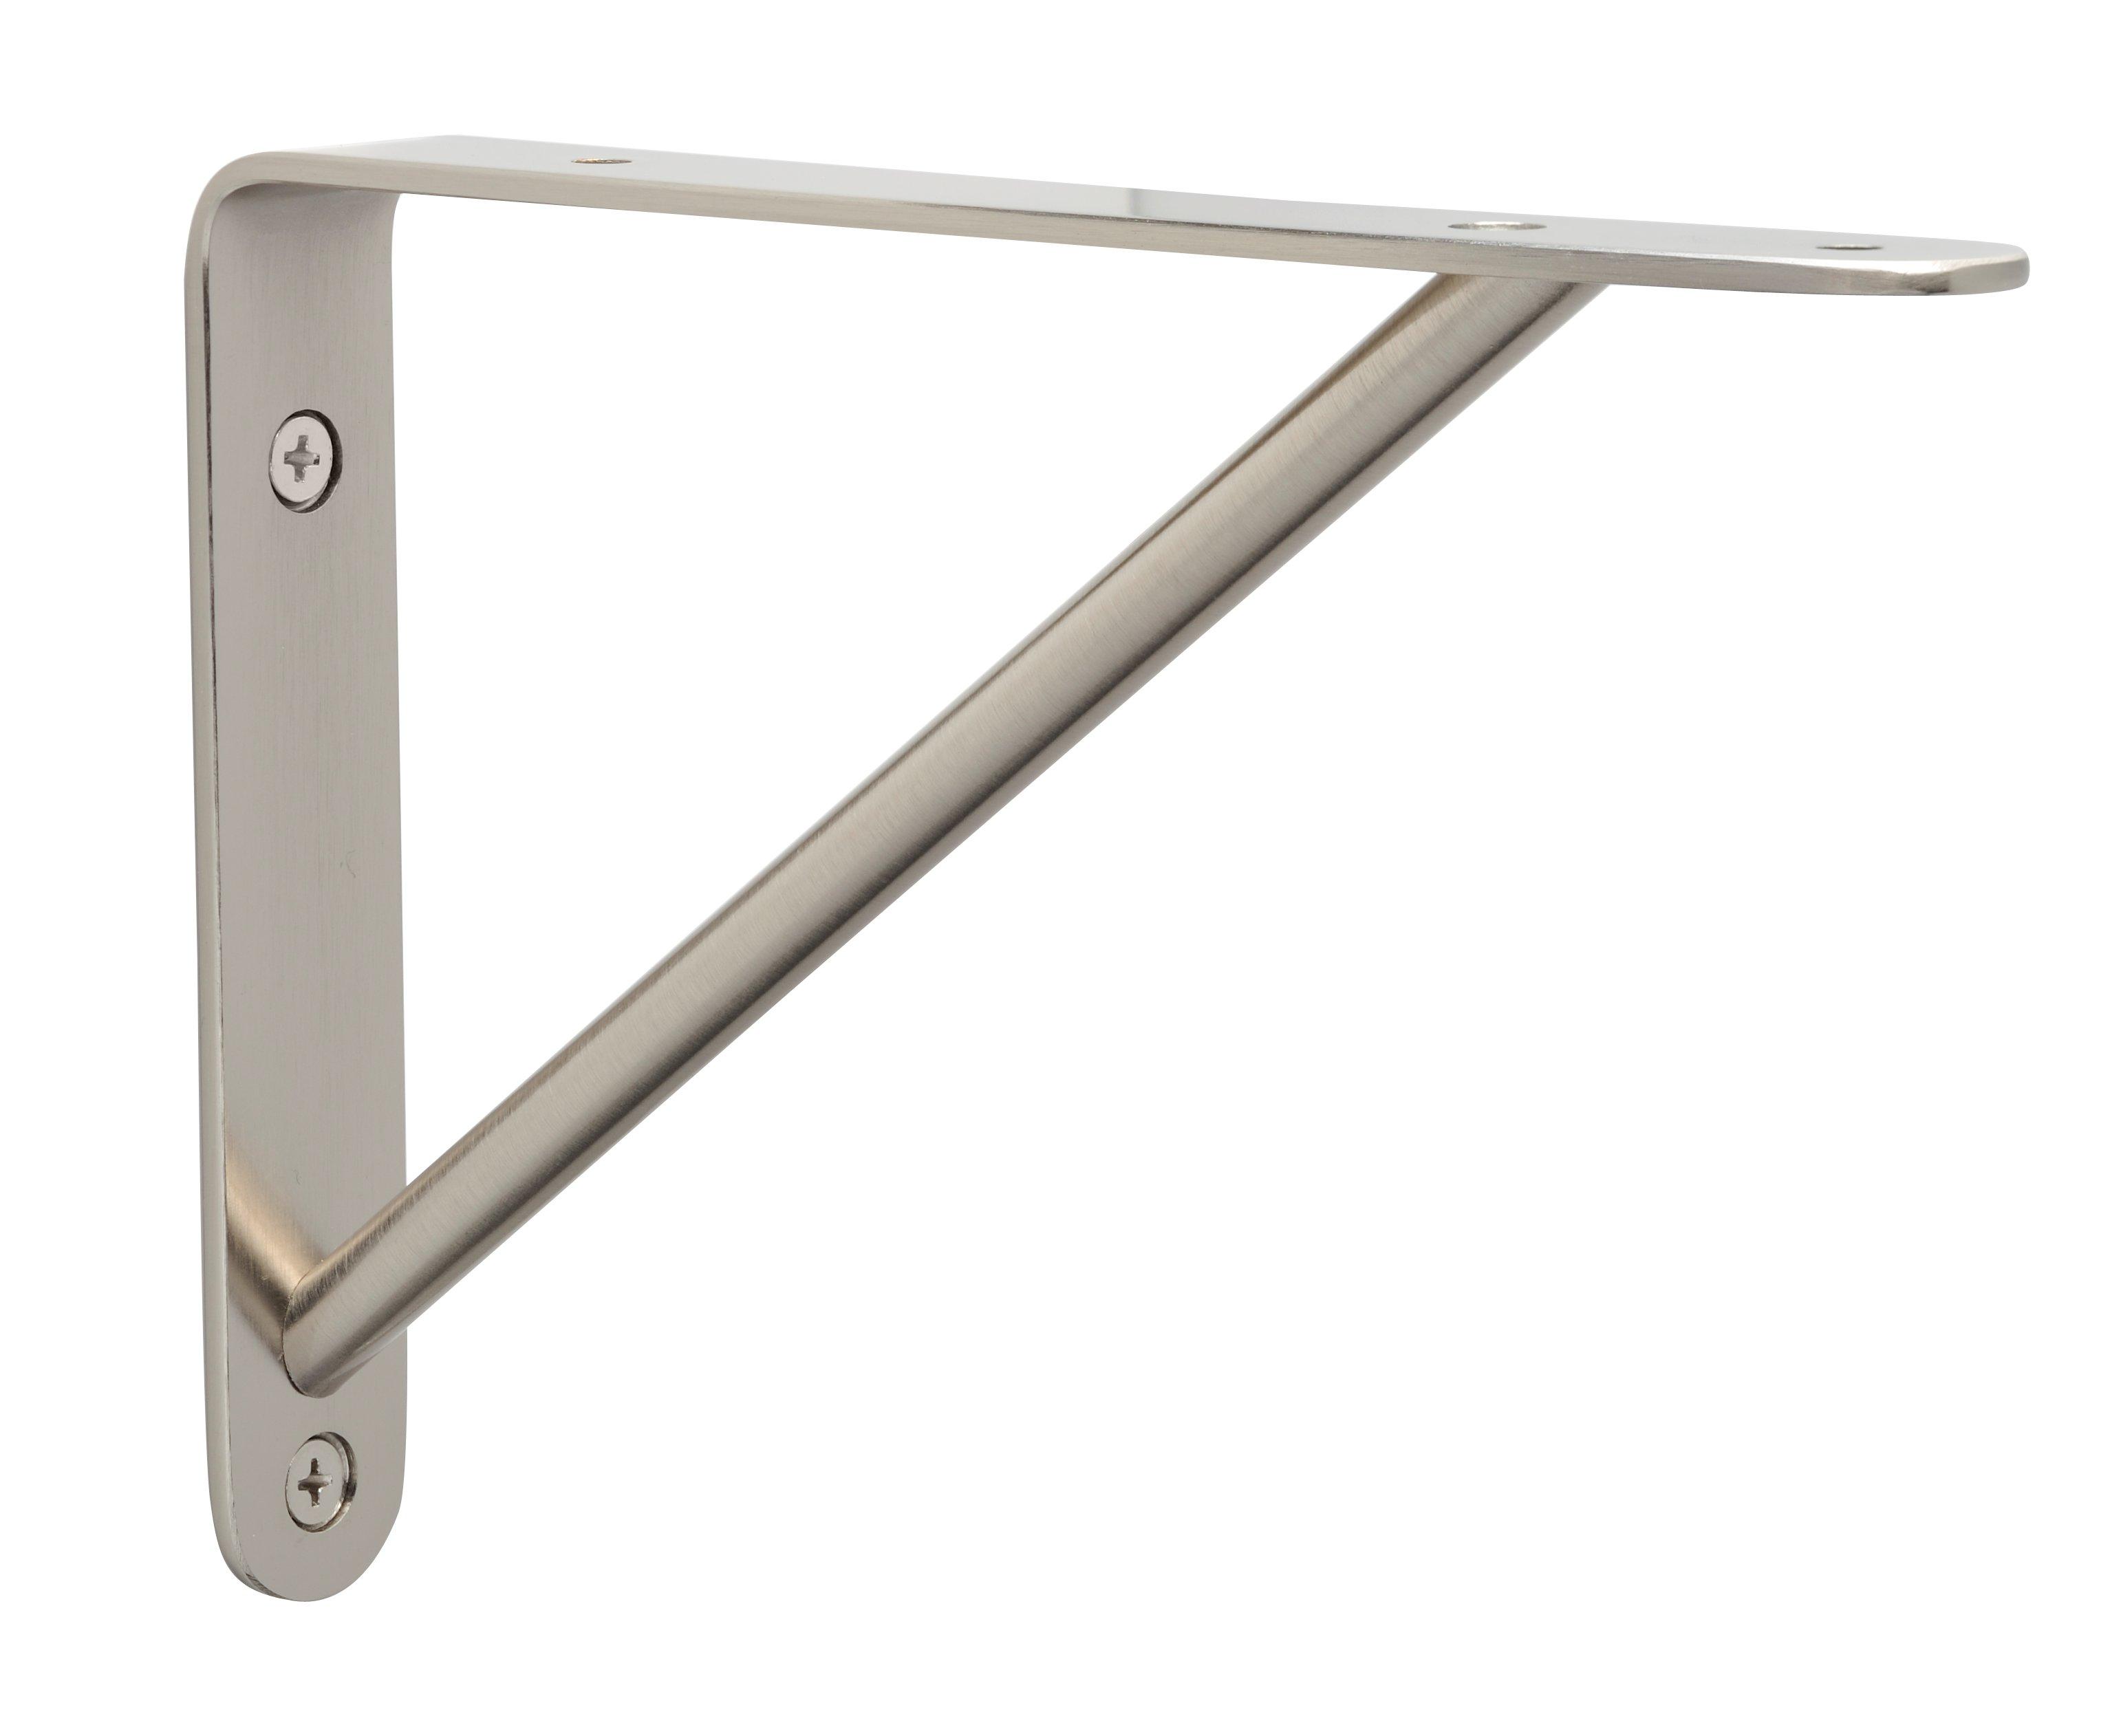 garage shelving bracket ideas - Cascadia Modern Shelf Bracket CRM 20 SN Satin Nickel